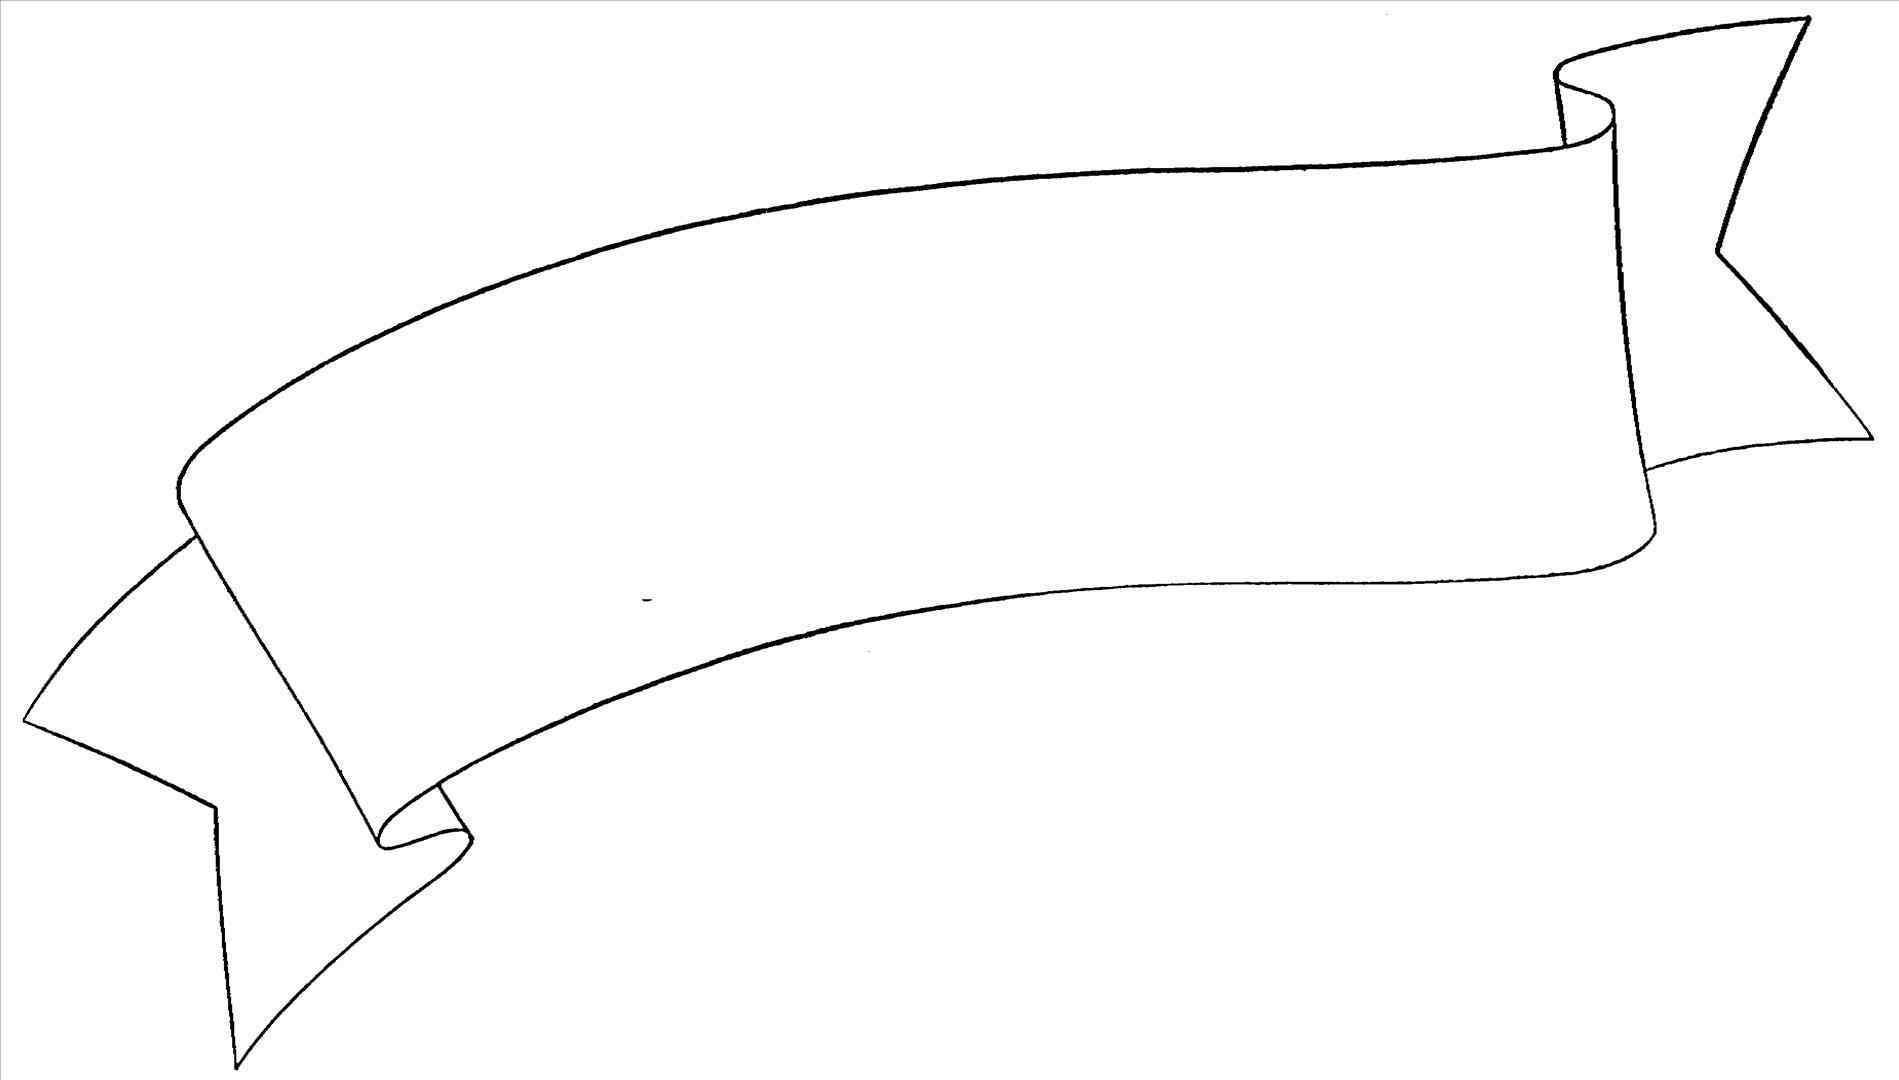 Epd psd rhtemplatenet shapes. Banner clipart shape